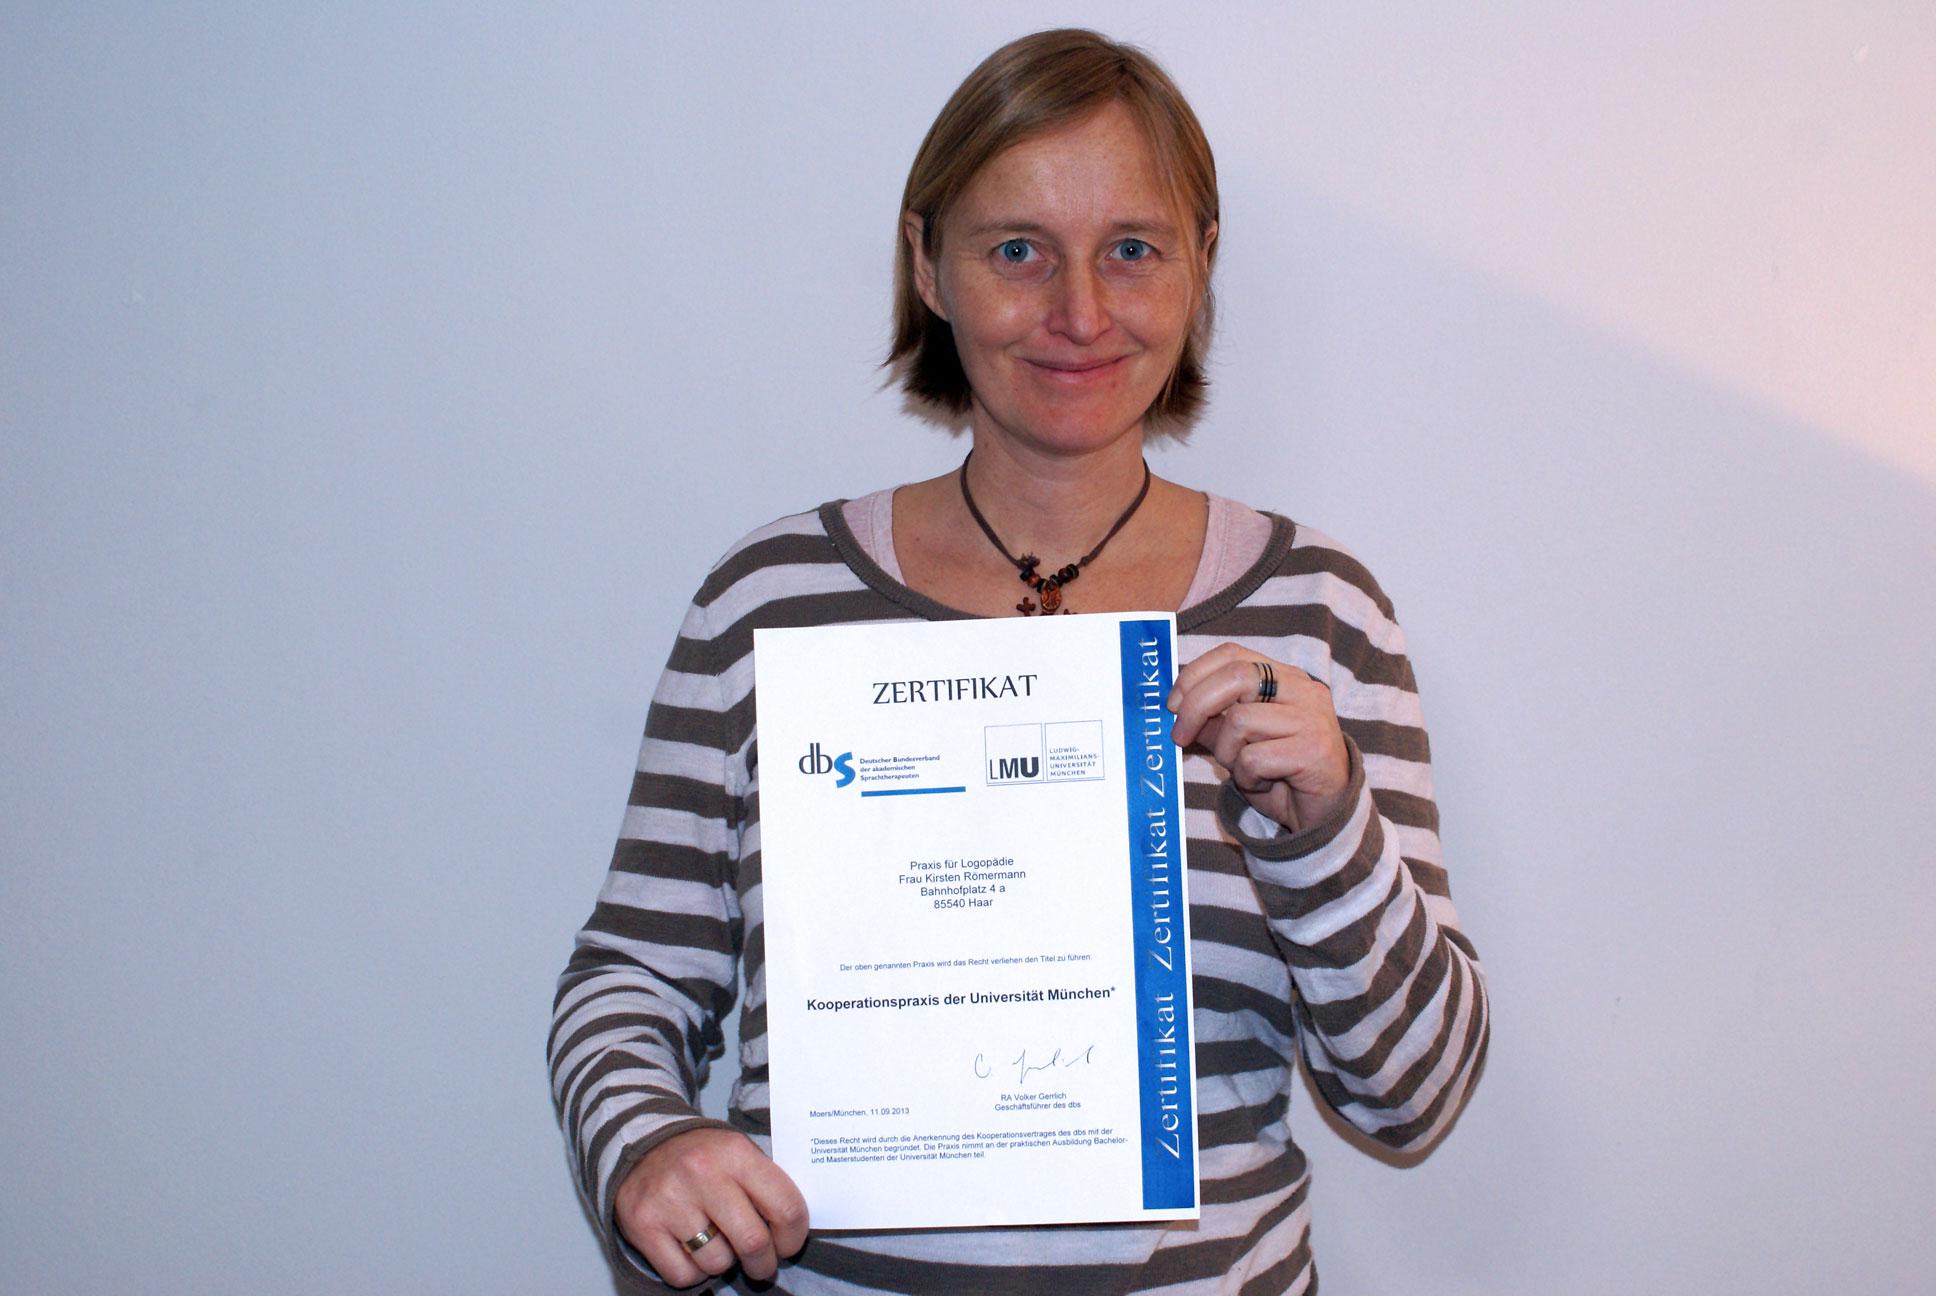 Zertifikat Universität München - Logopädie Römermann aus Haar